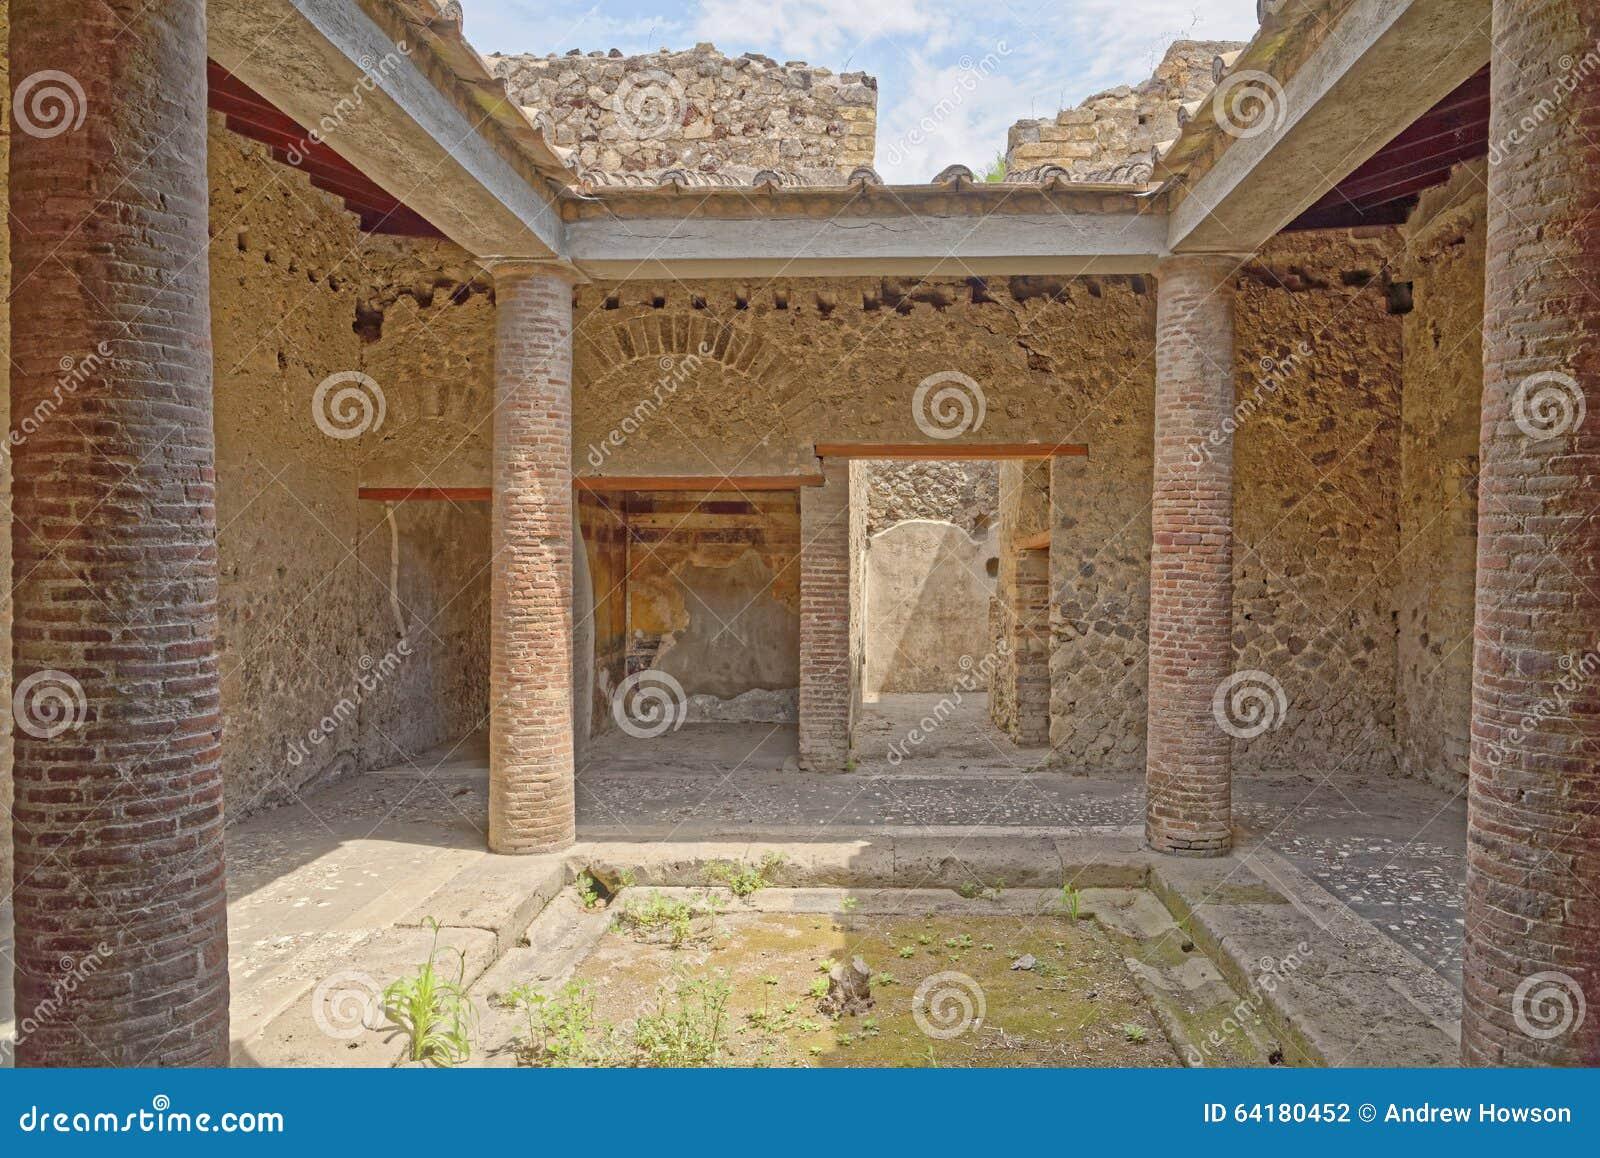 Roman villa, Pompeii